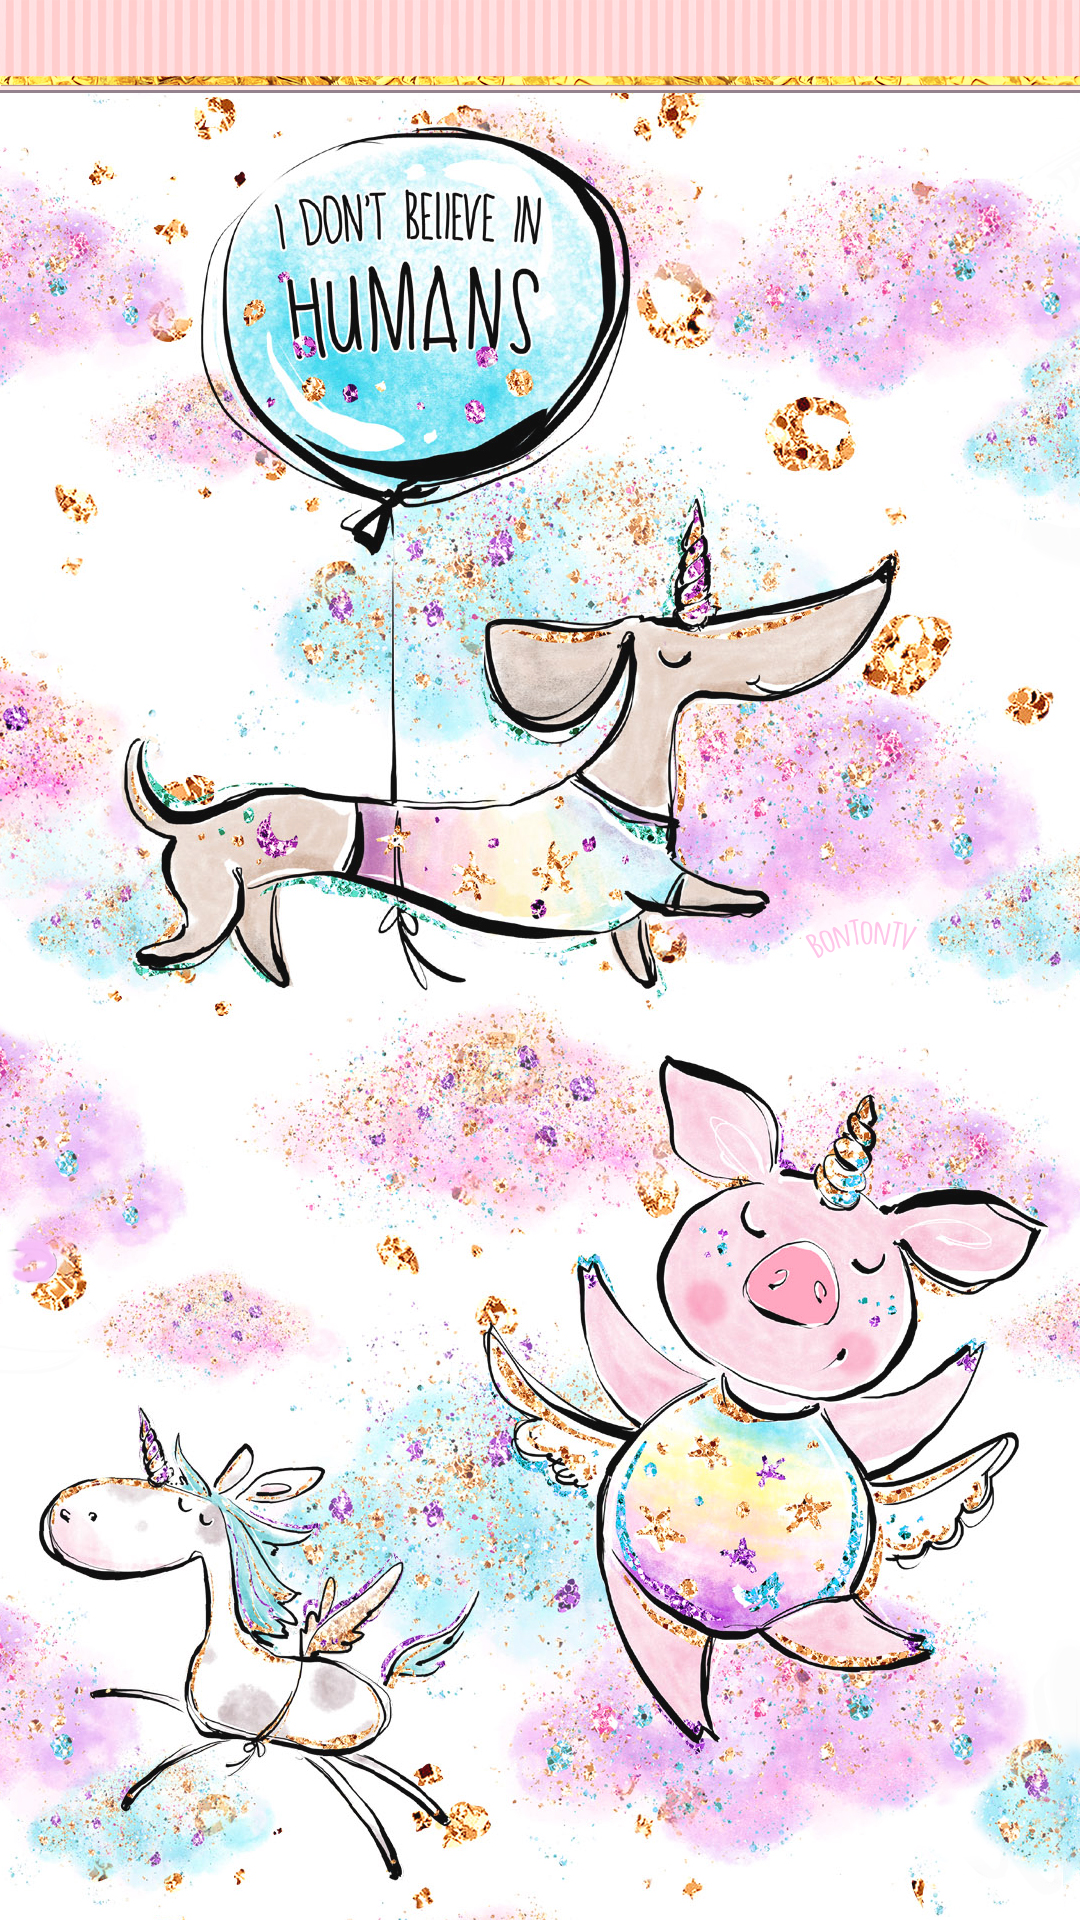 Phone Wallpapers Hd Cute Unicorn Glitter Art By Bonton Tv